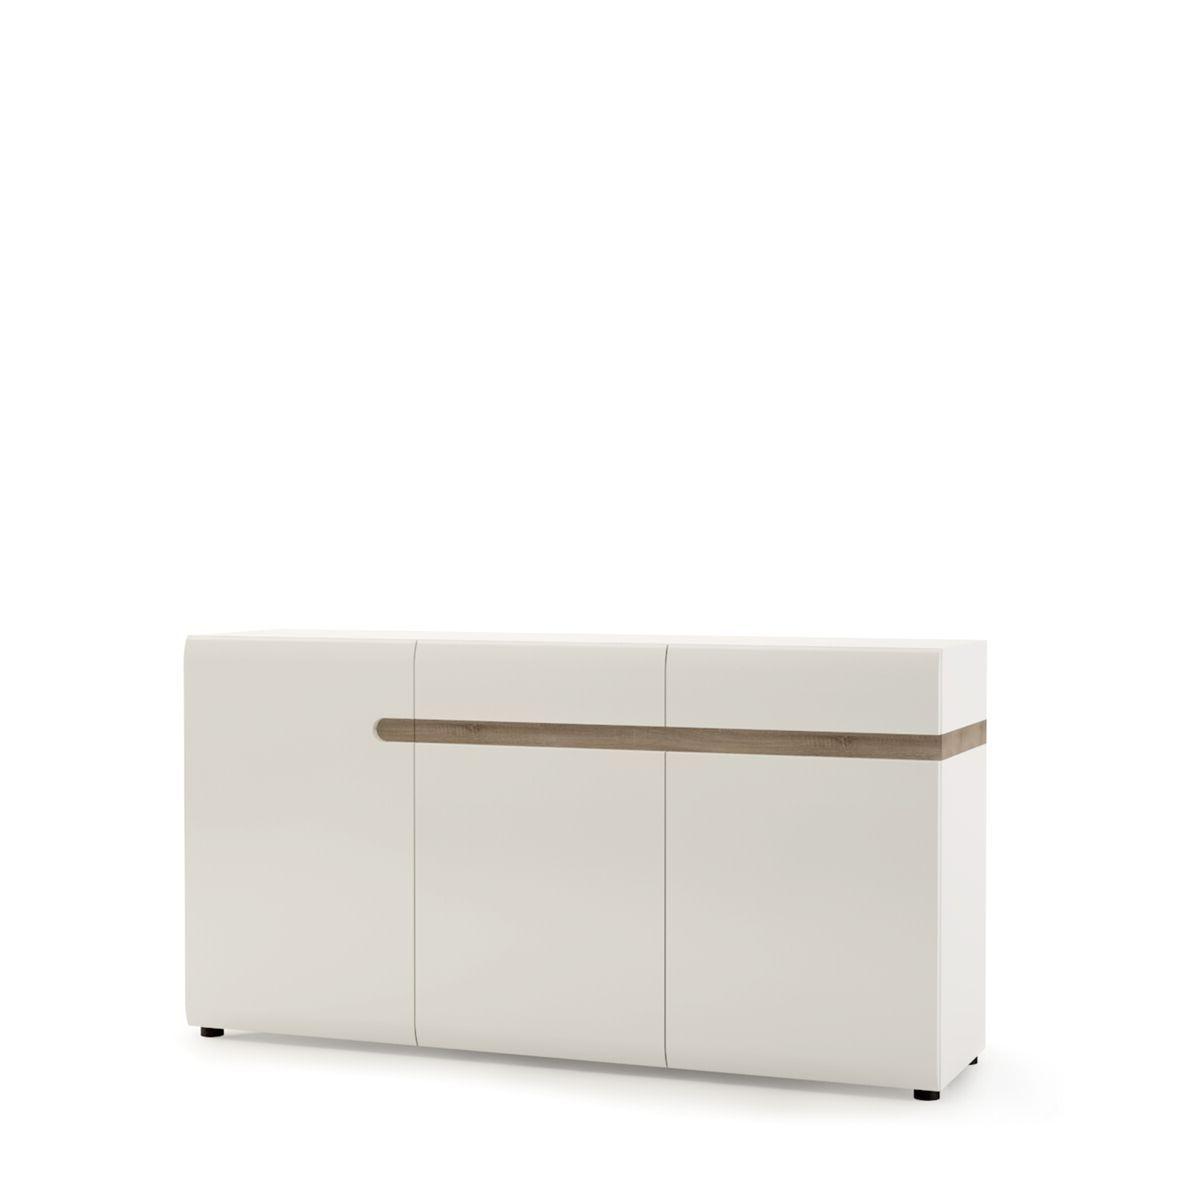 Furniture To Go Chelsea Living 2 Drawer 3 Door Sideboard In White In Trendy Burn Tan Finish 2 Door Sideboards (View 10 of 20)